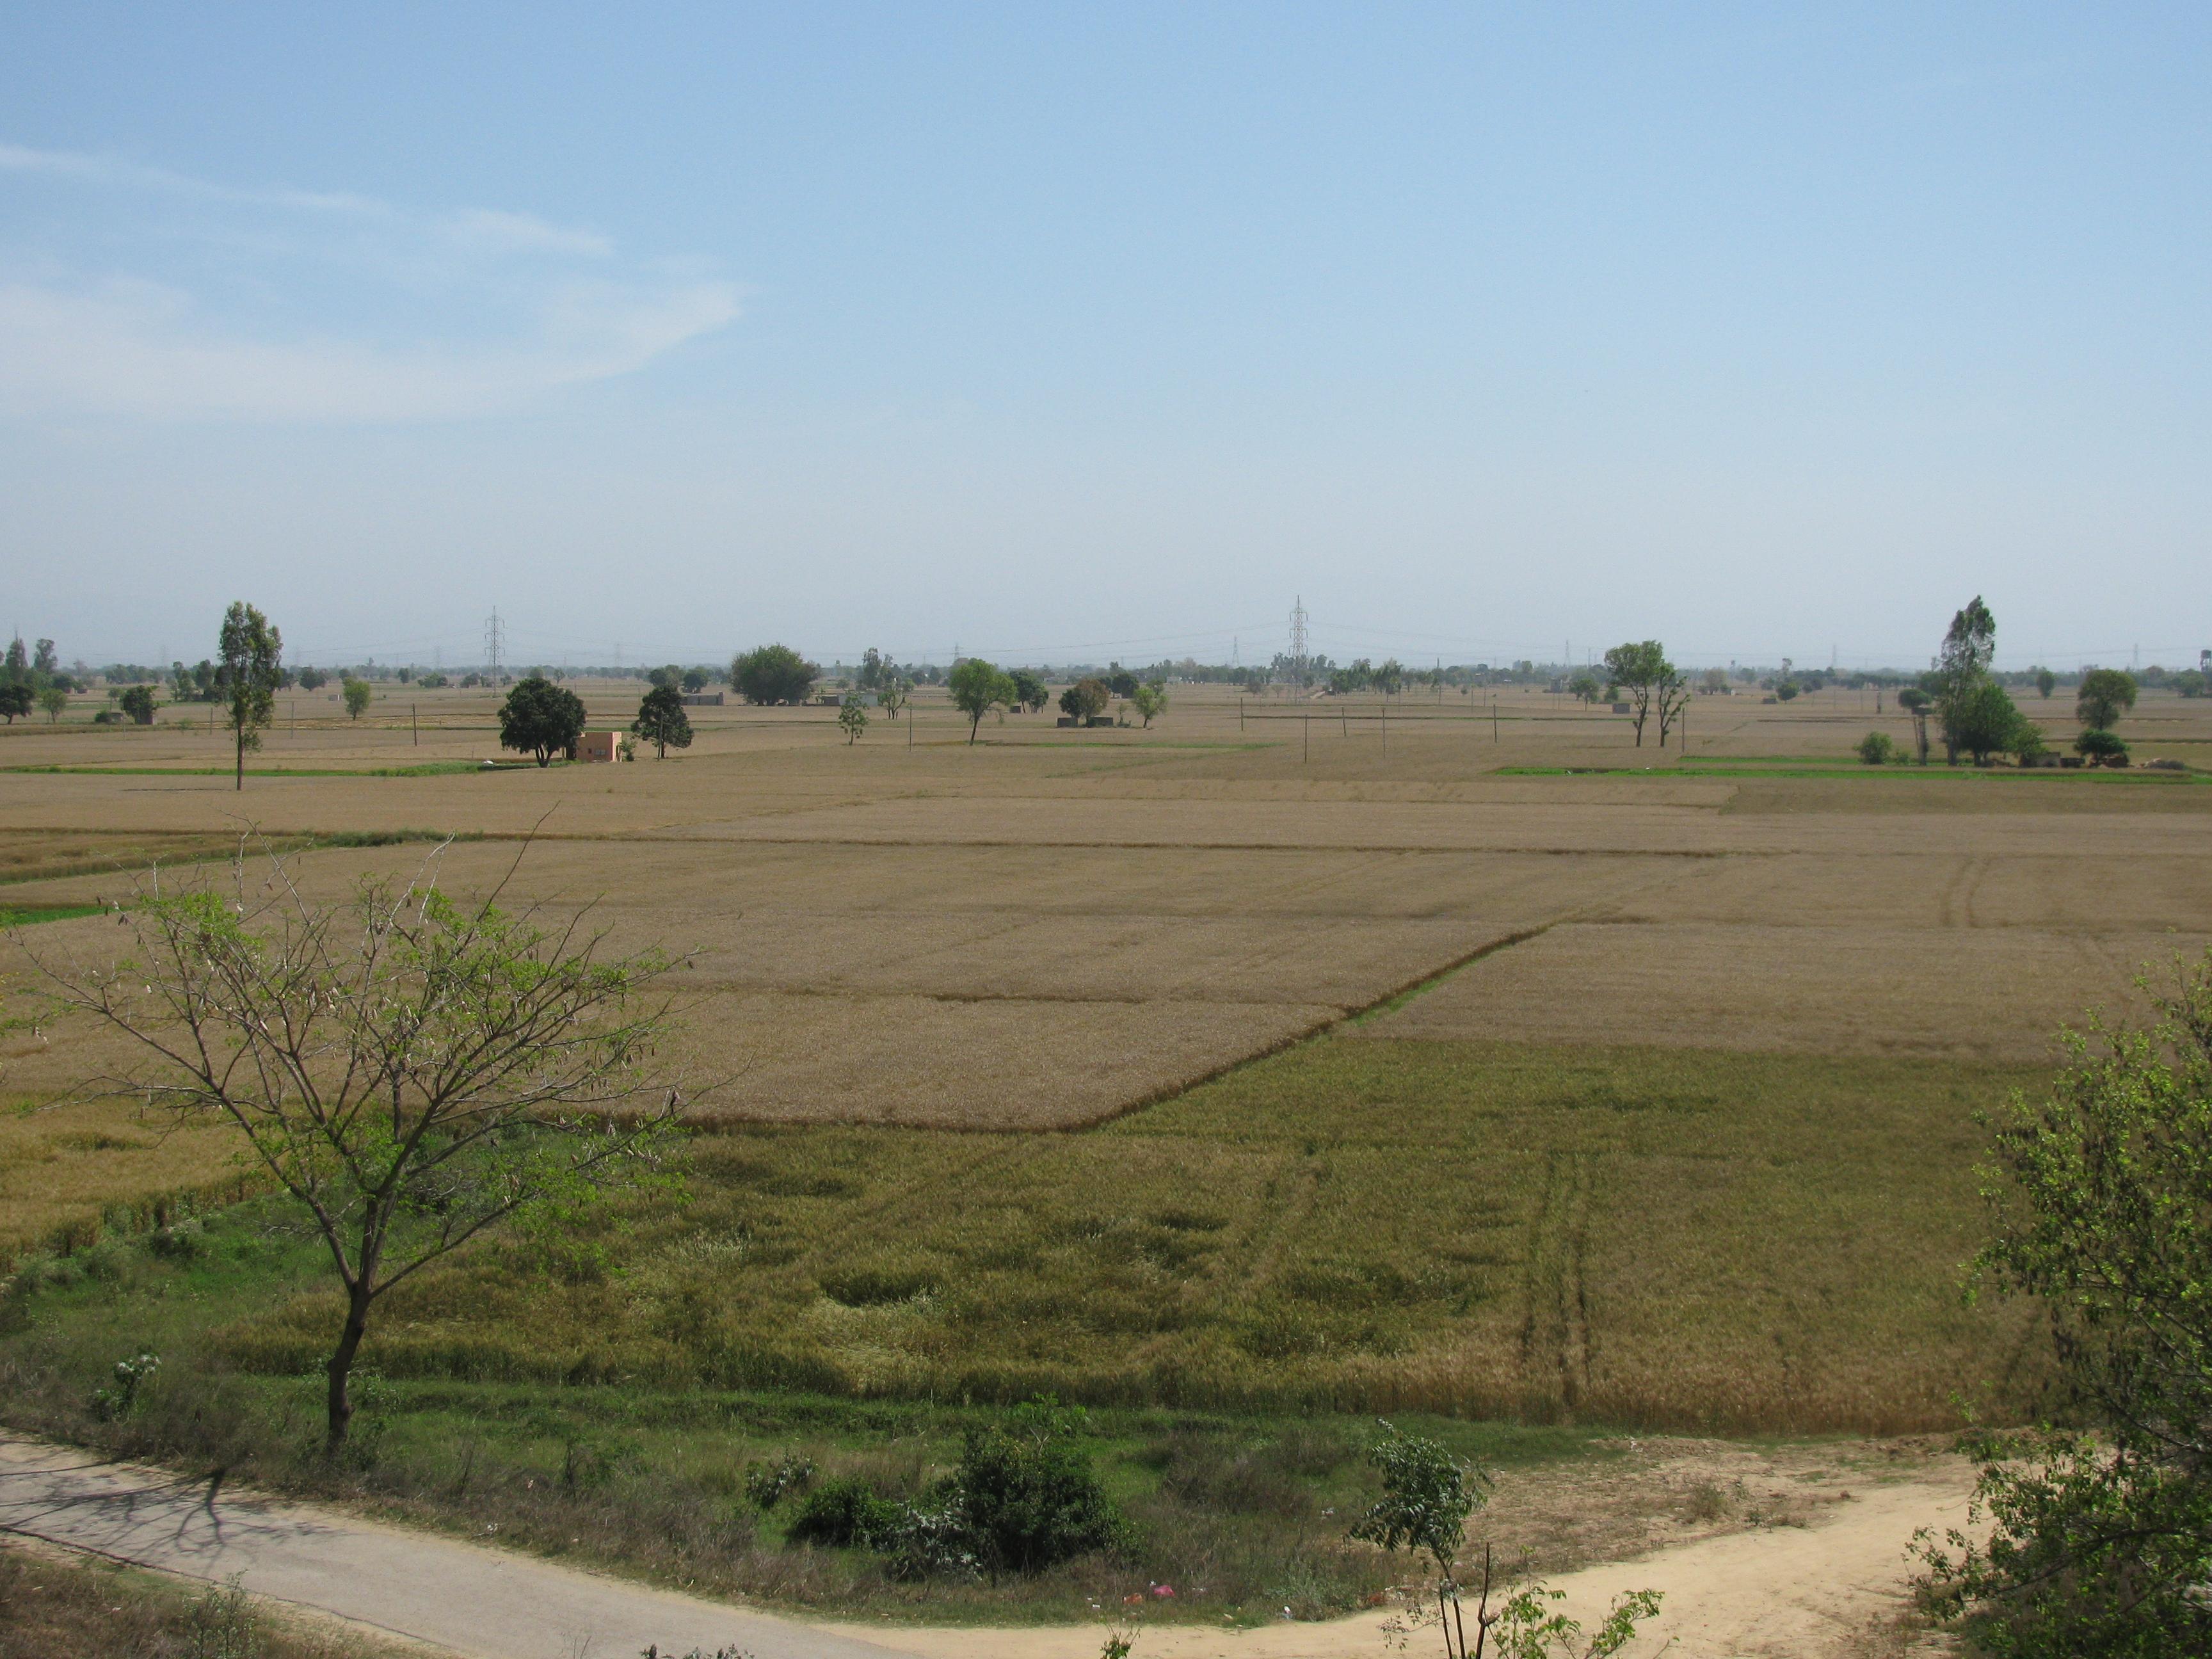 File:Typical Punjabi Landscape.JPG - Wikimedia Commons